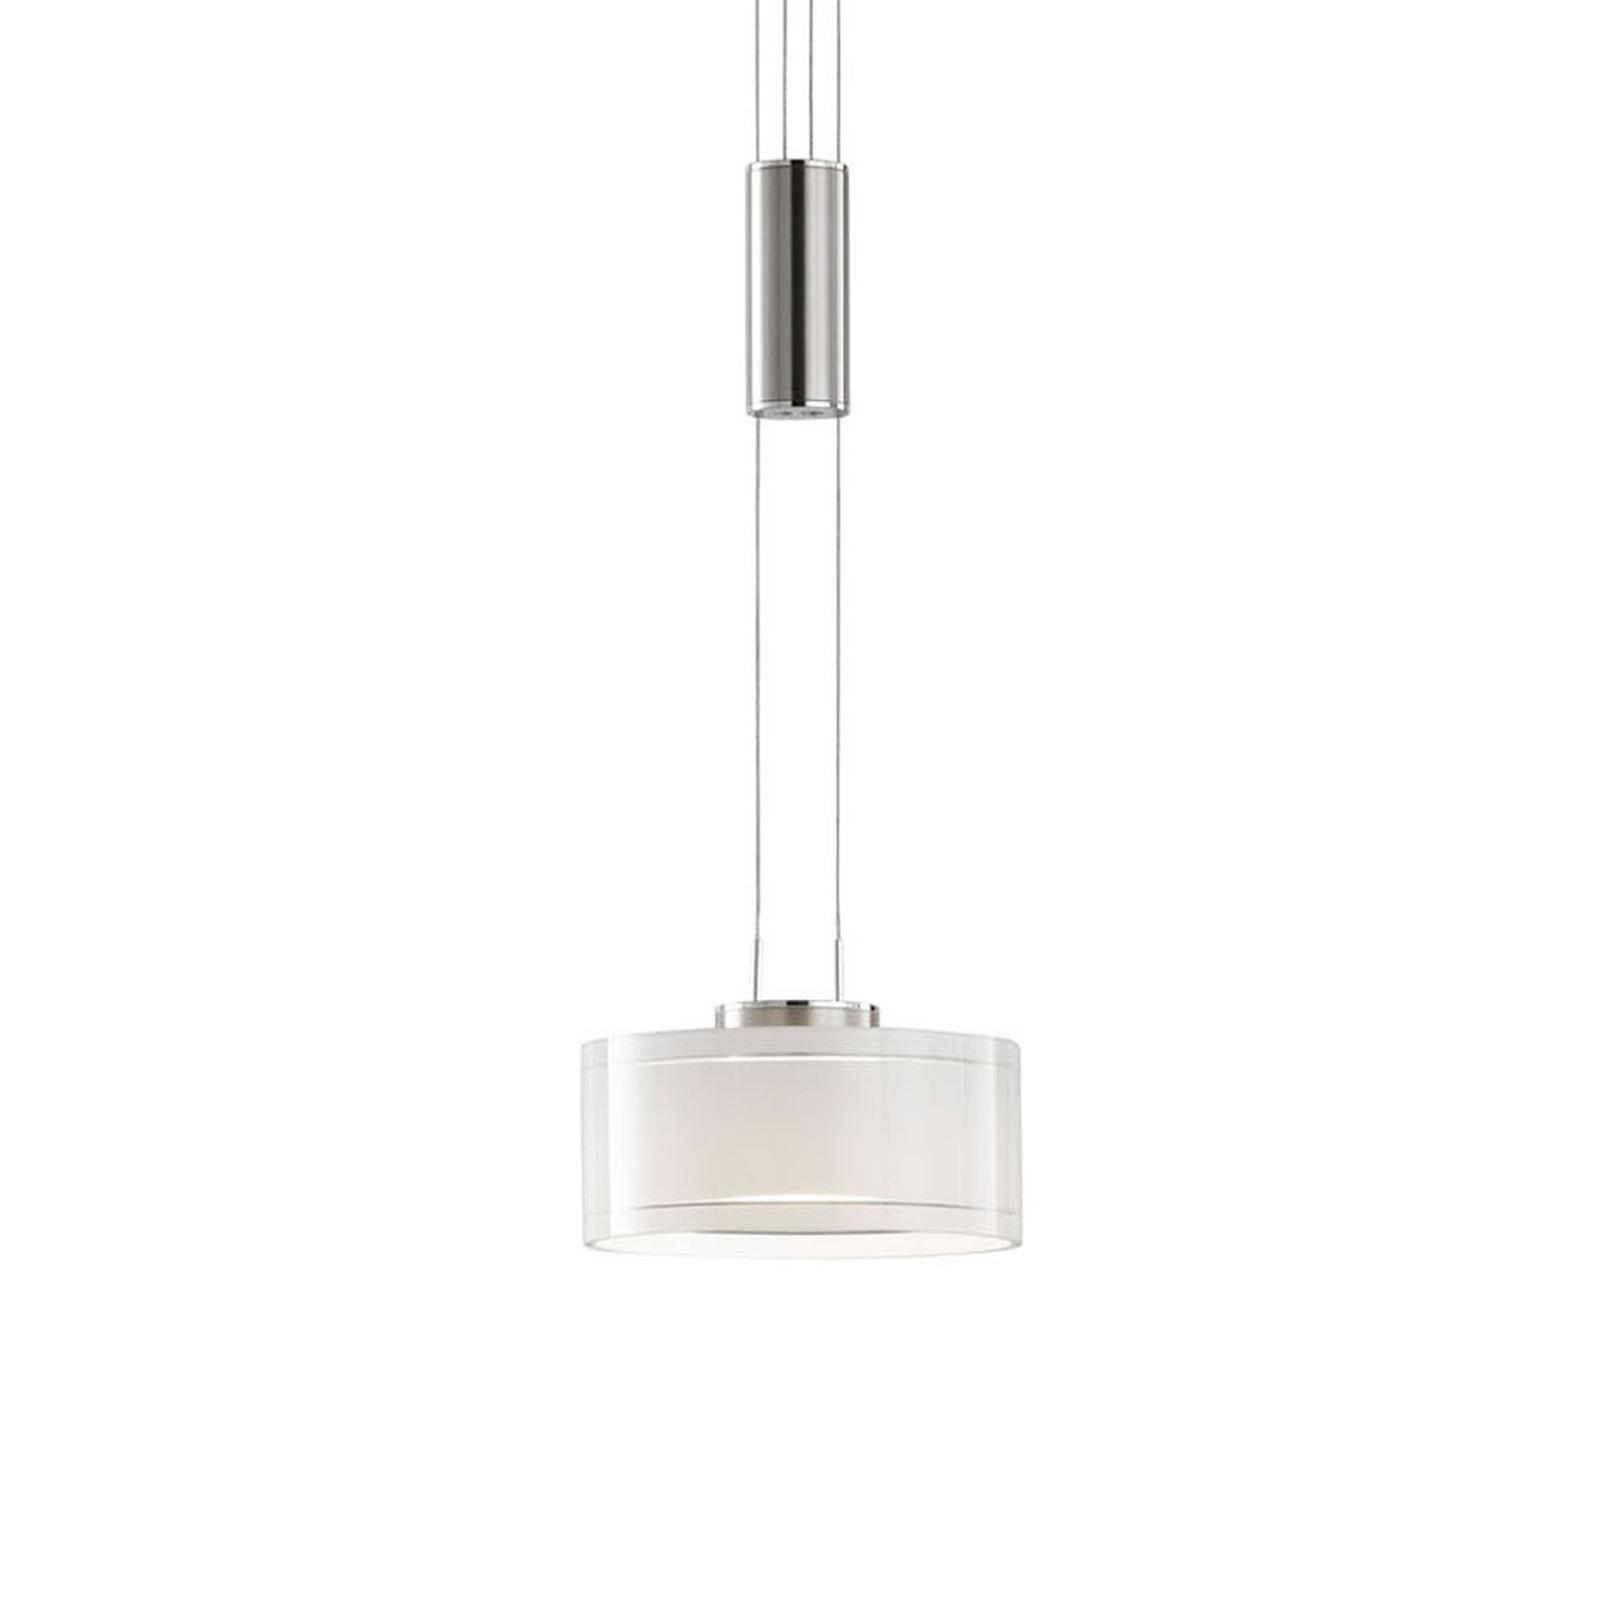 Suspension LED Lavine, à 1 lampe nickel/blanche